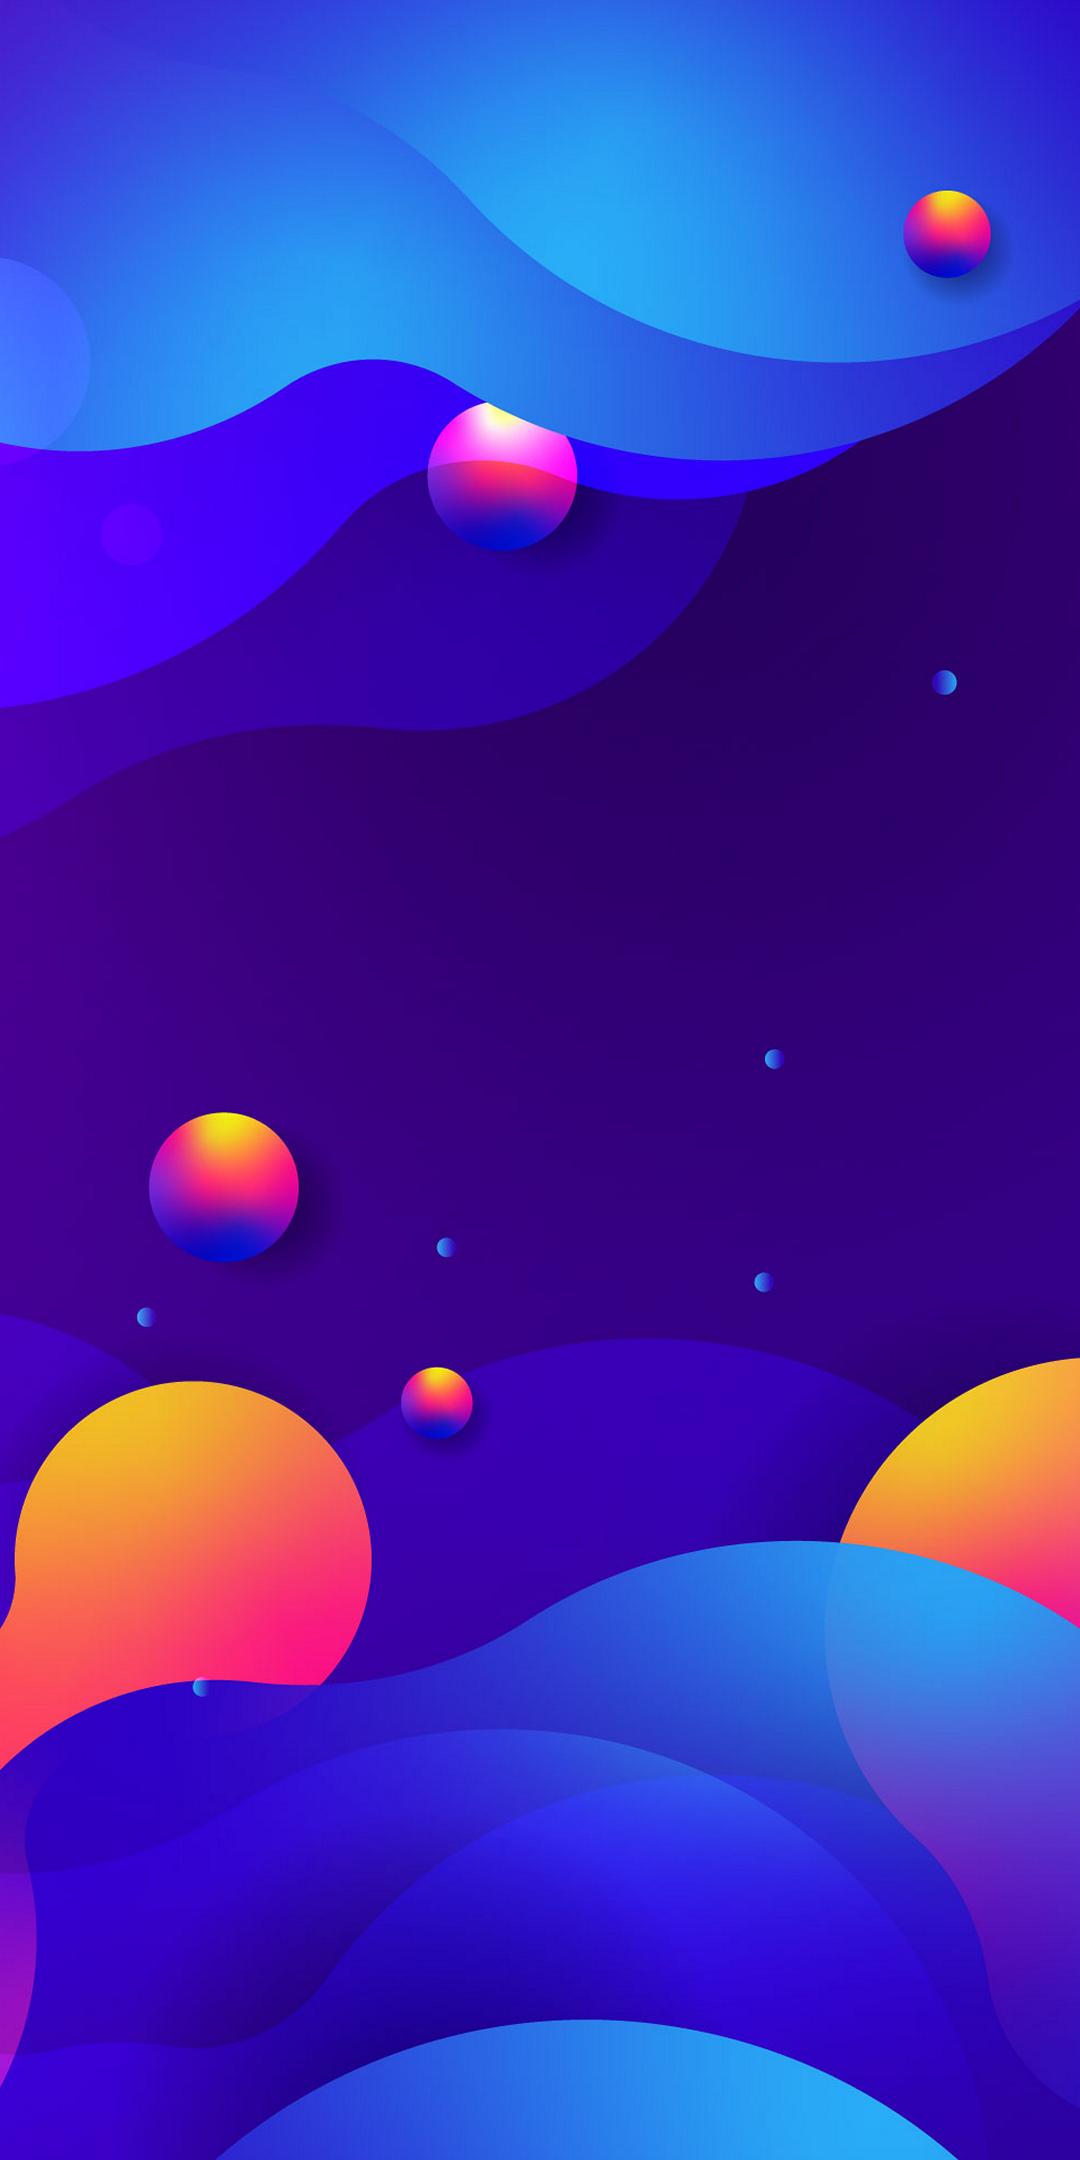 Обои colorful, background, geometry, colors, Abstract, shapes, rainbow. Абстракции foto 2